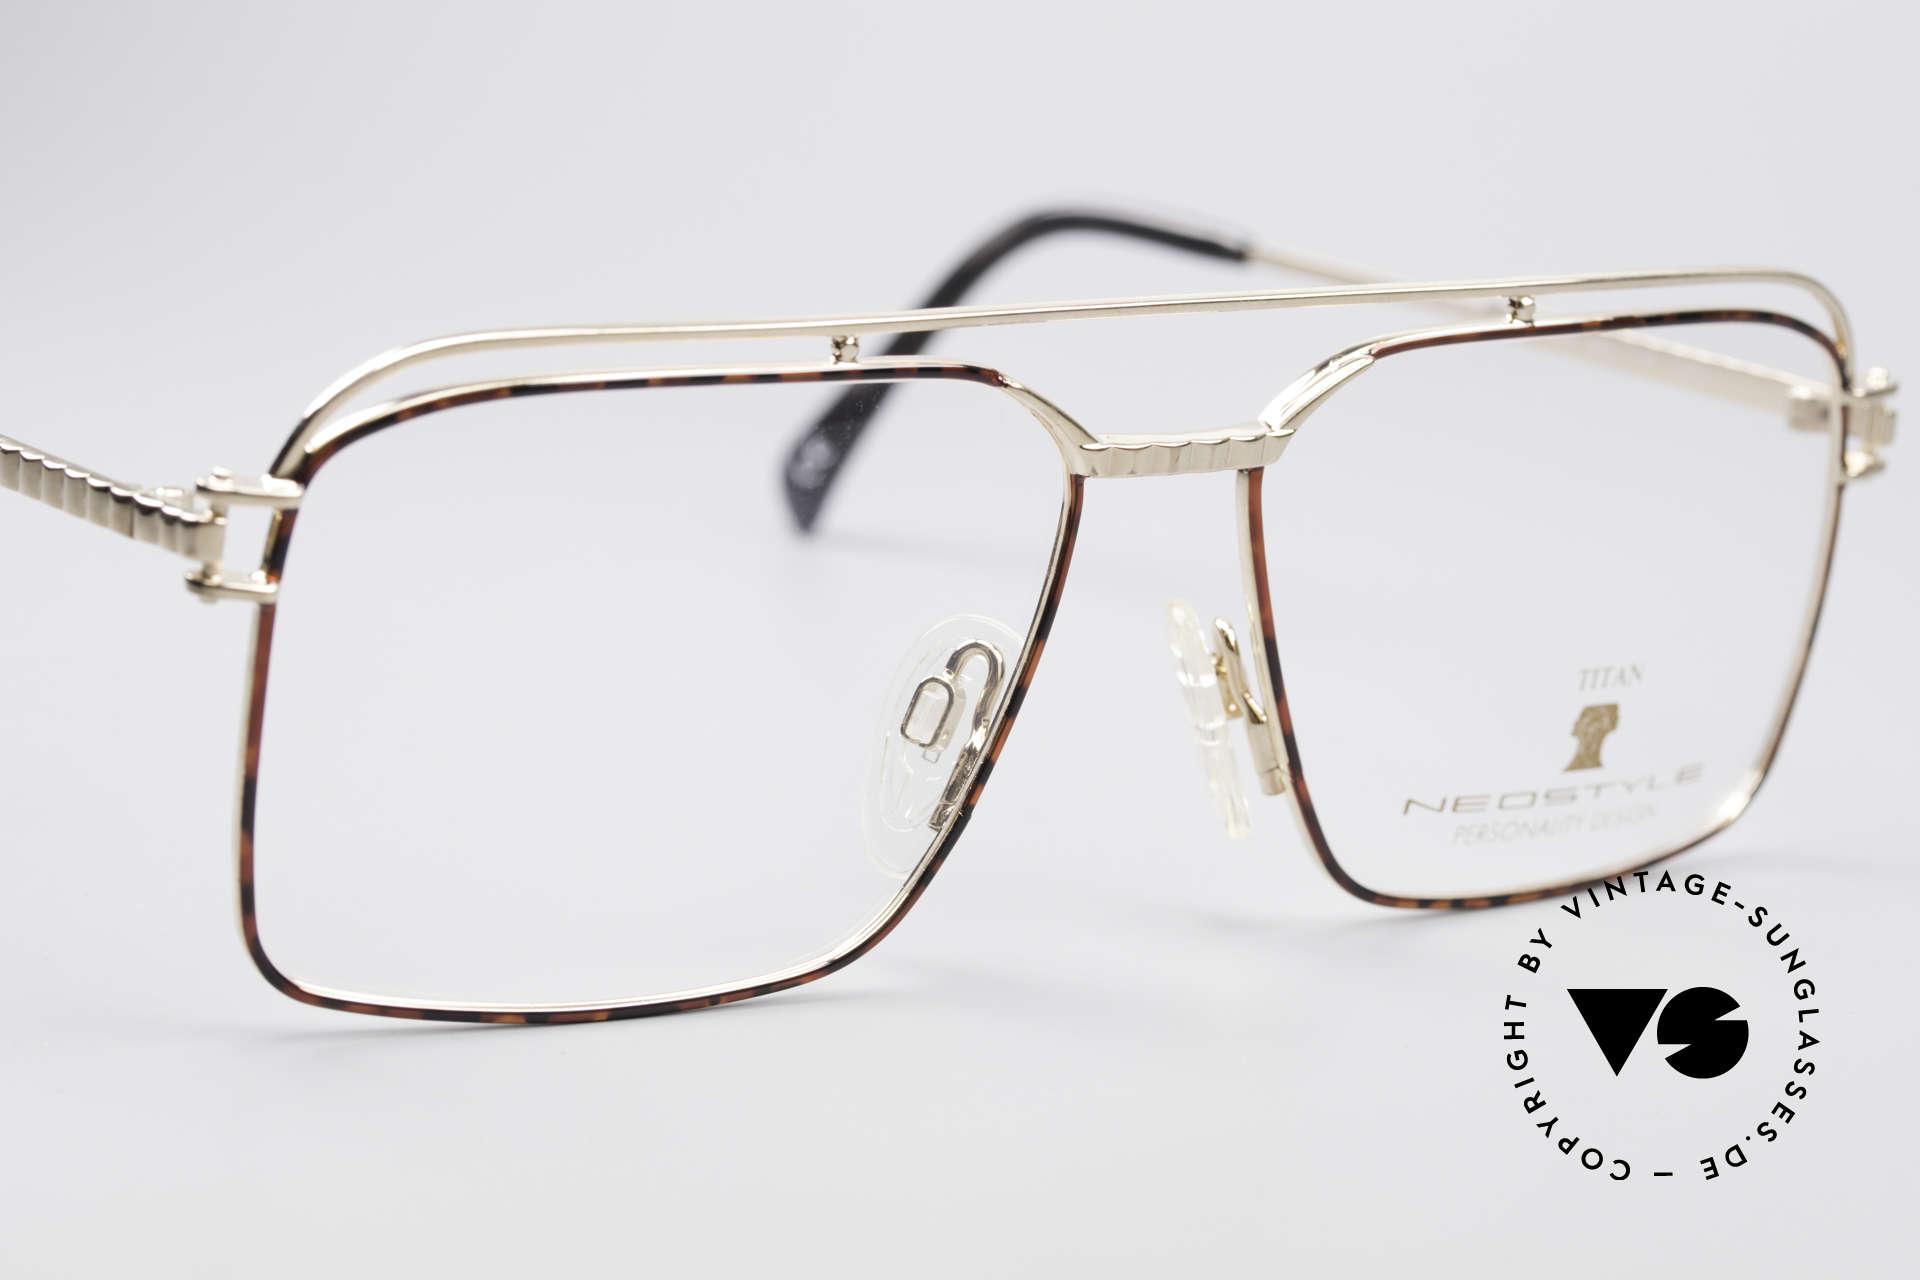 Neostyle Dynasty 424 - L 80's Titanium Men's Frame, never worn (like all our rare vintage eyeglasses), Made for Men